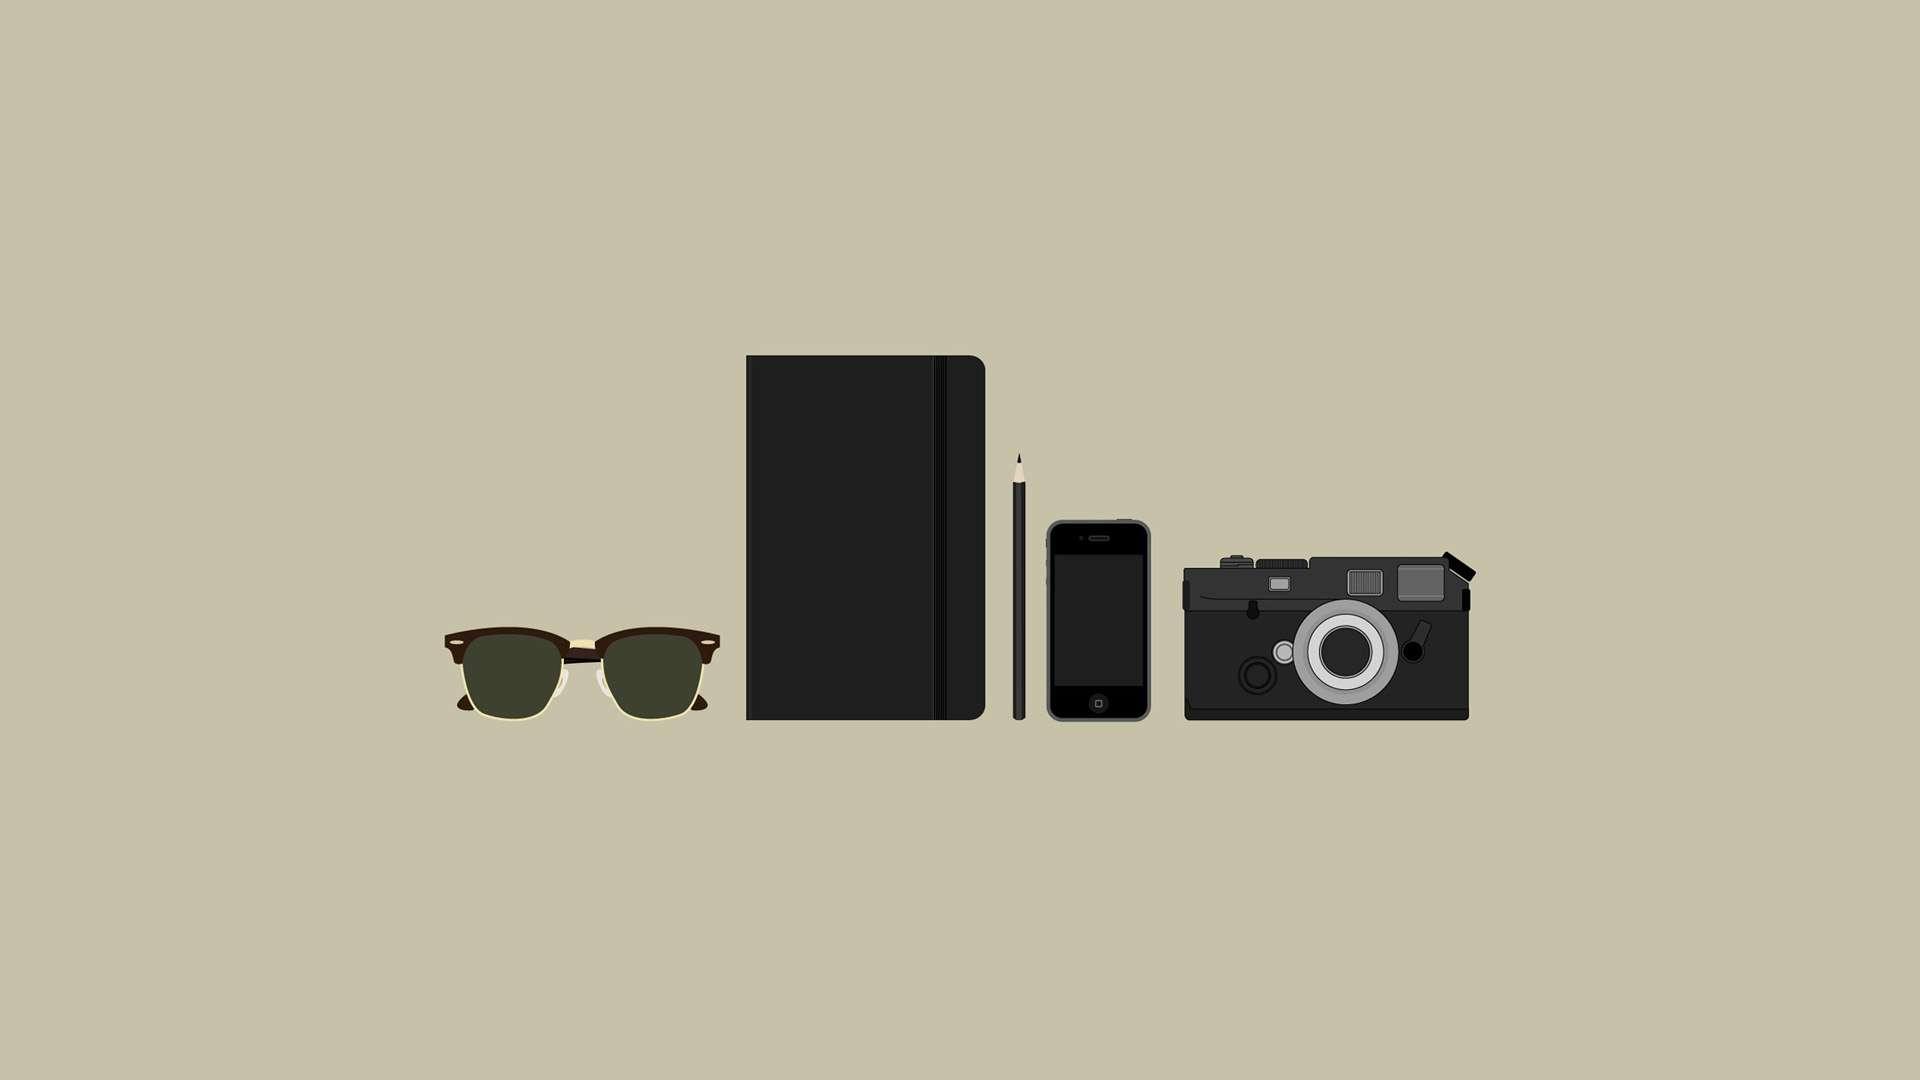 Hd wallpaper hipster - Hipster Gear Hd Wallpaper Fullhdwpp Full Hd Wallpapers 1920x1080